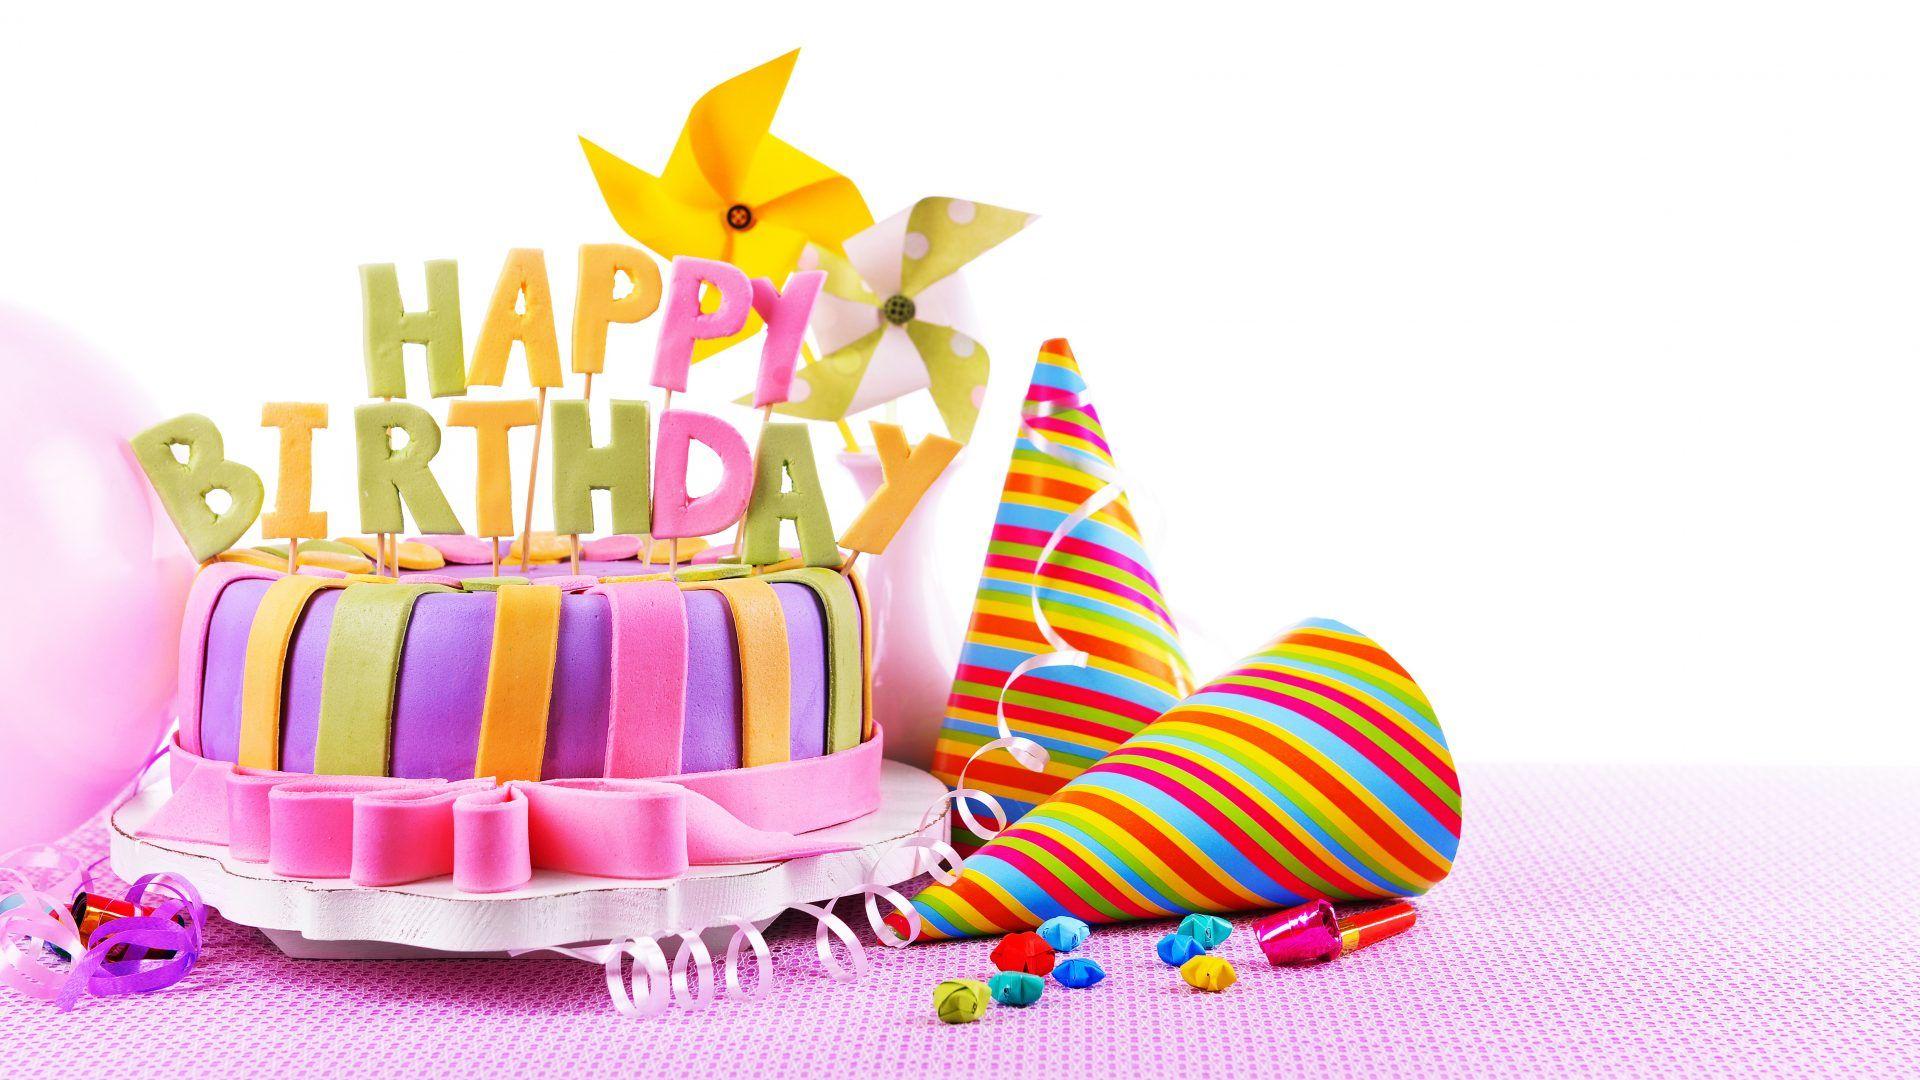 Cheerful happy birthday cake HD Wallpapers Rocks